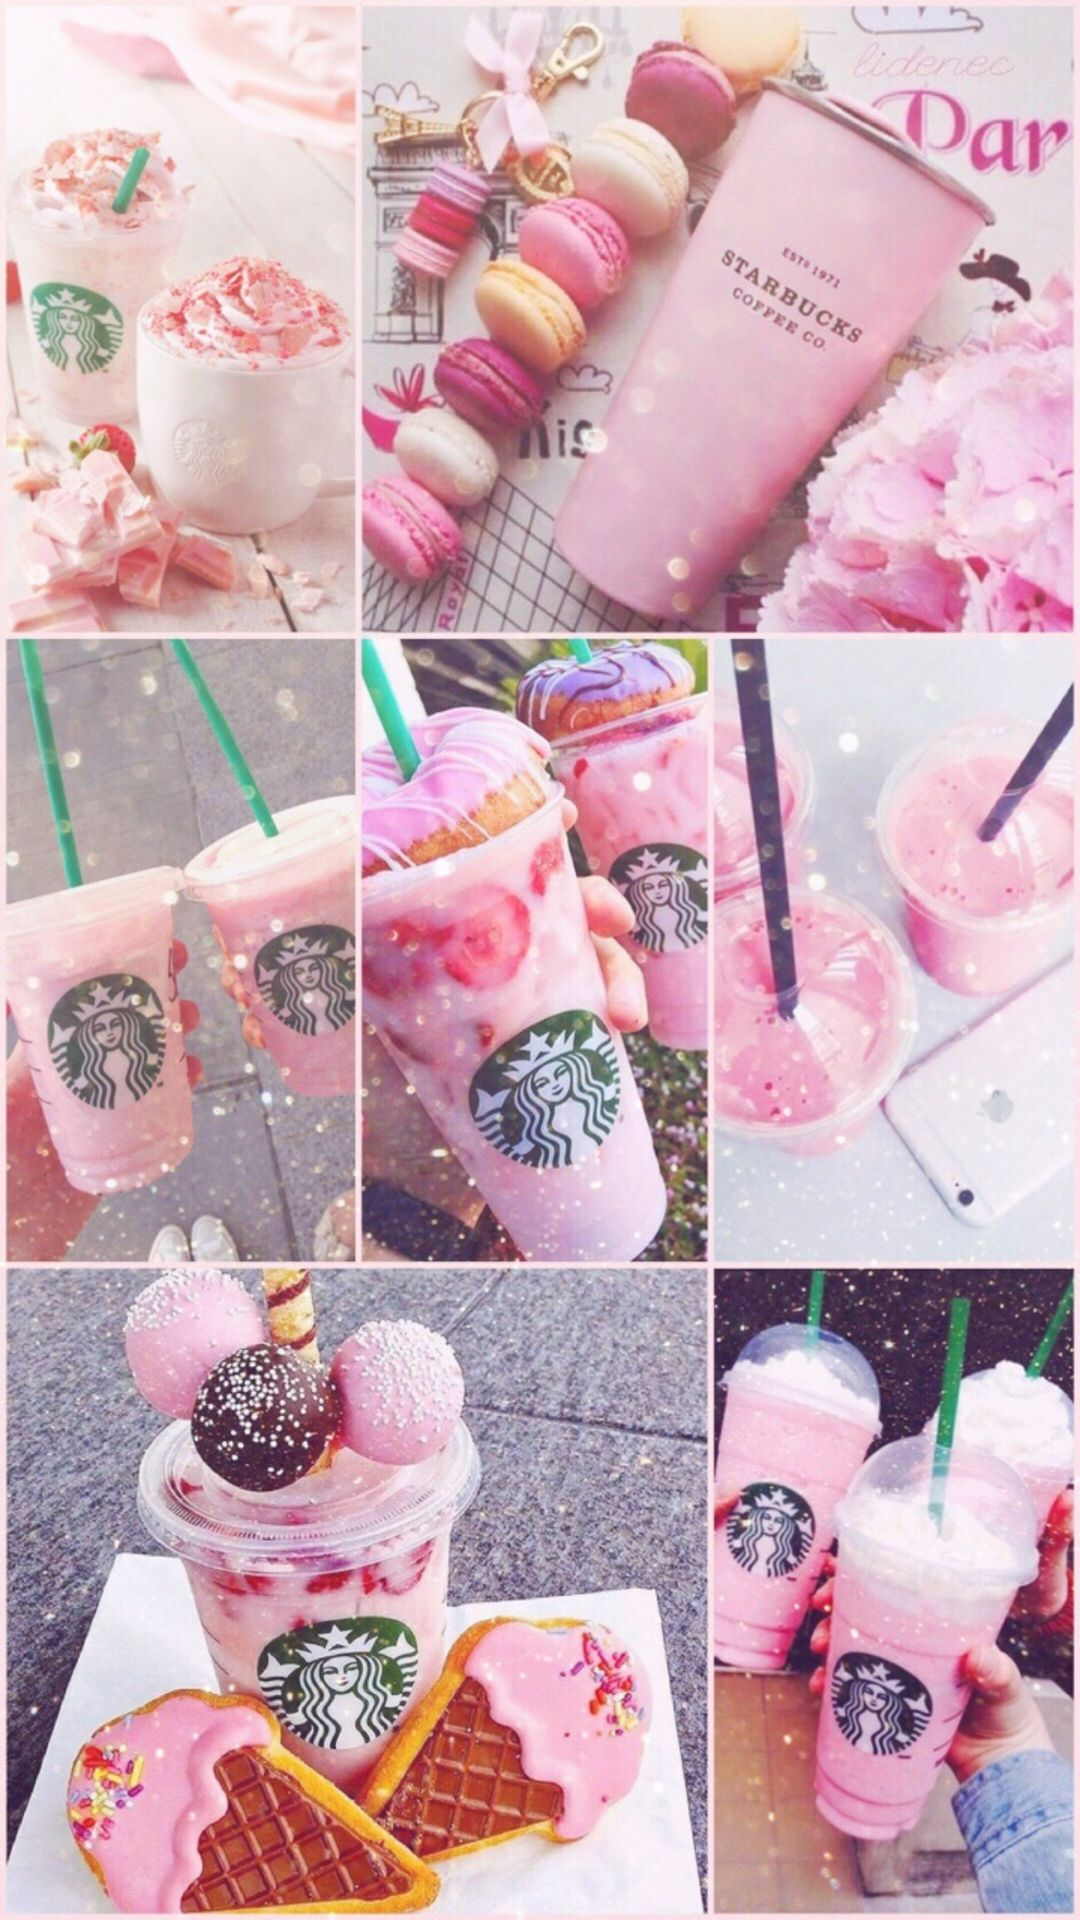 A Picture From Kefir Https Kefirapp Com W 2366140 Starbucks Wallpaper Pink Drinks Starbucks Drinks Recipes